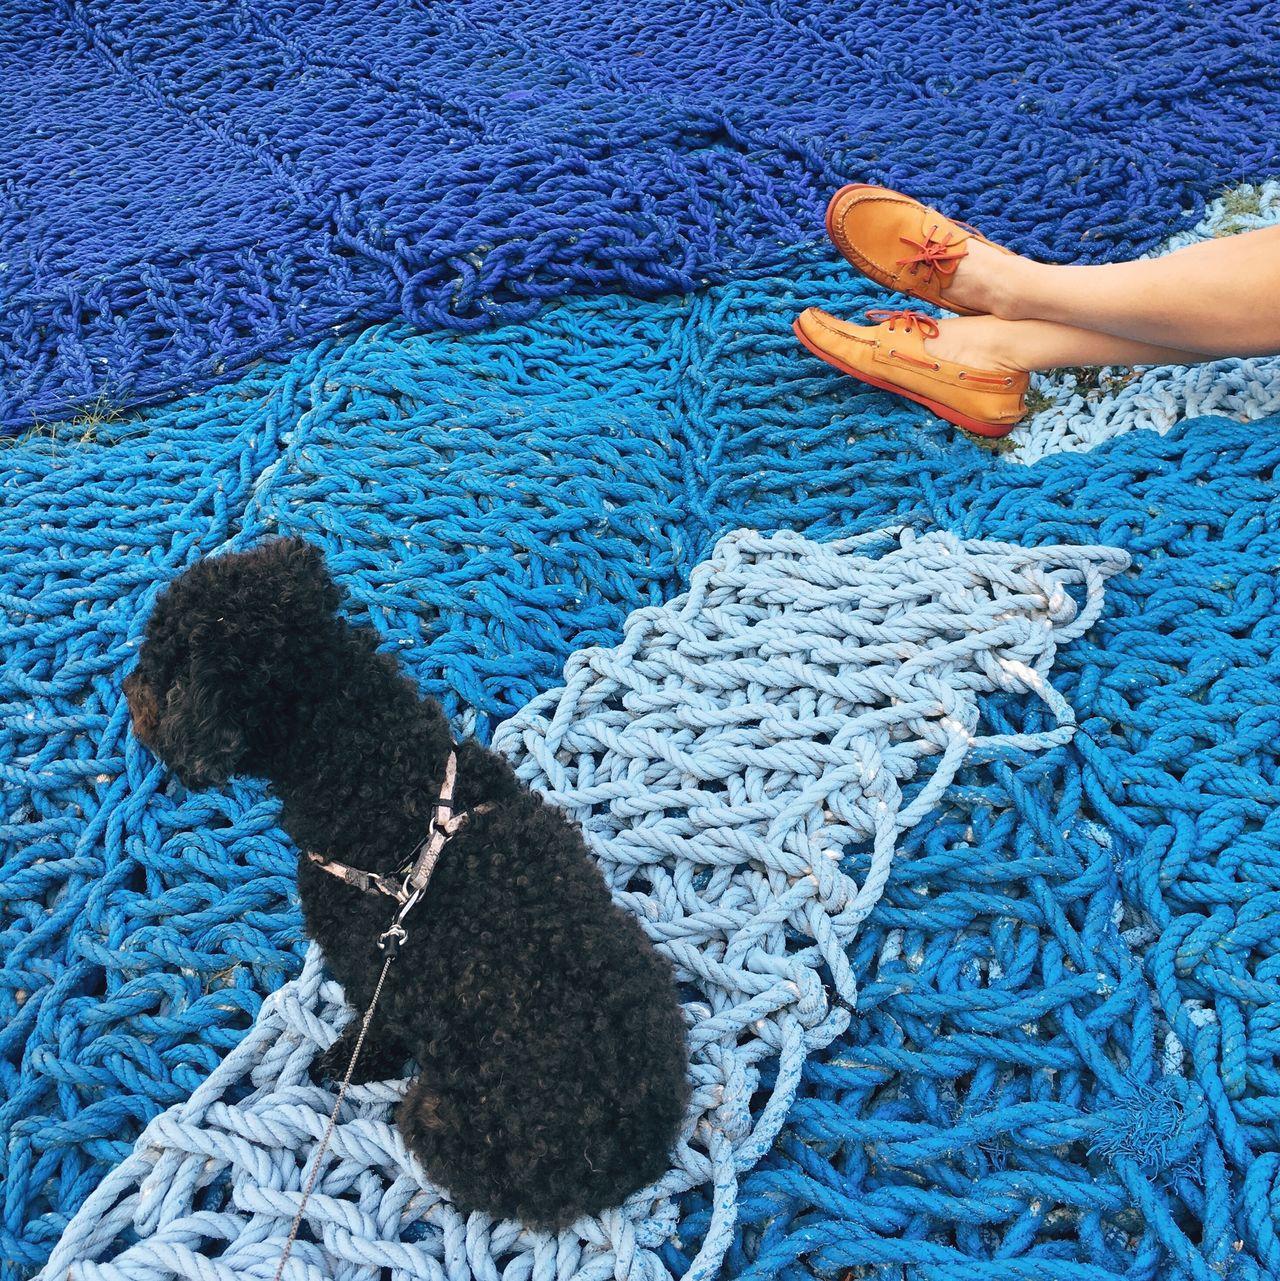 High angle view of woman and dog on fishing net